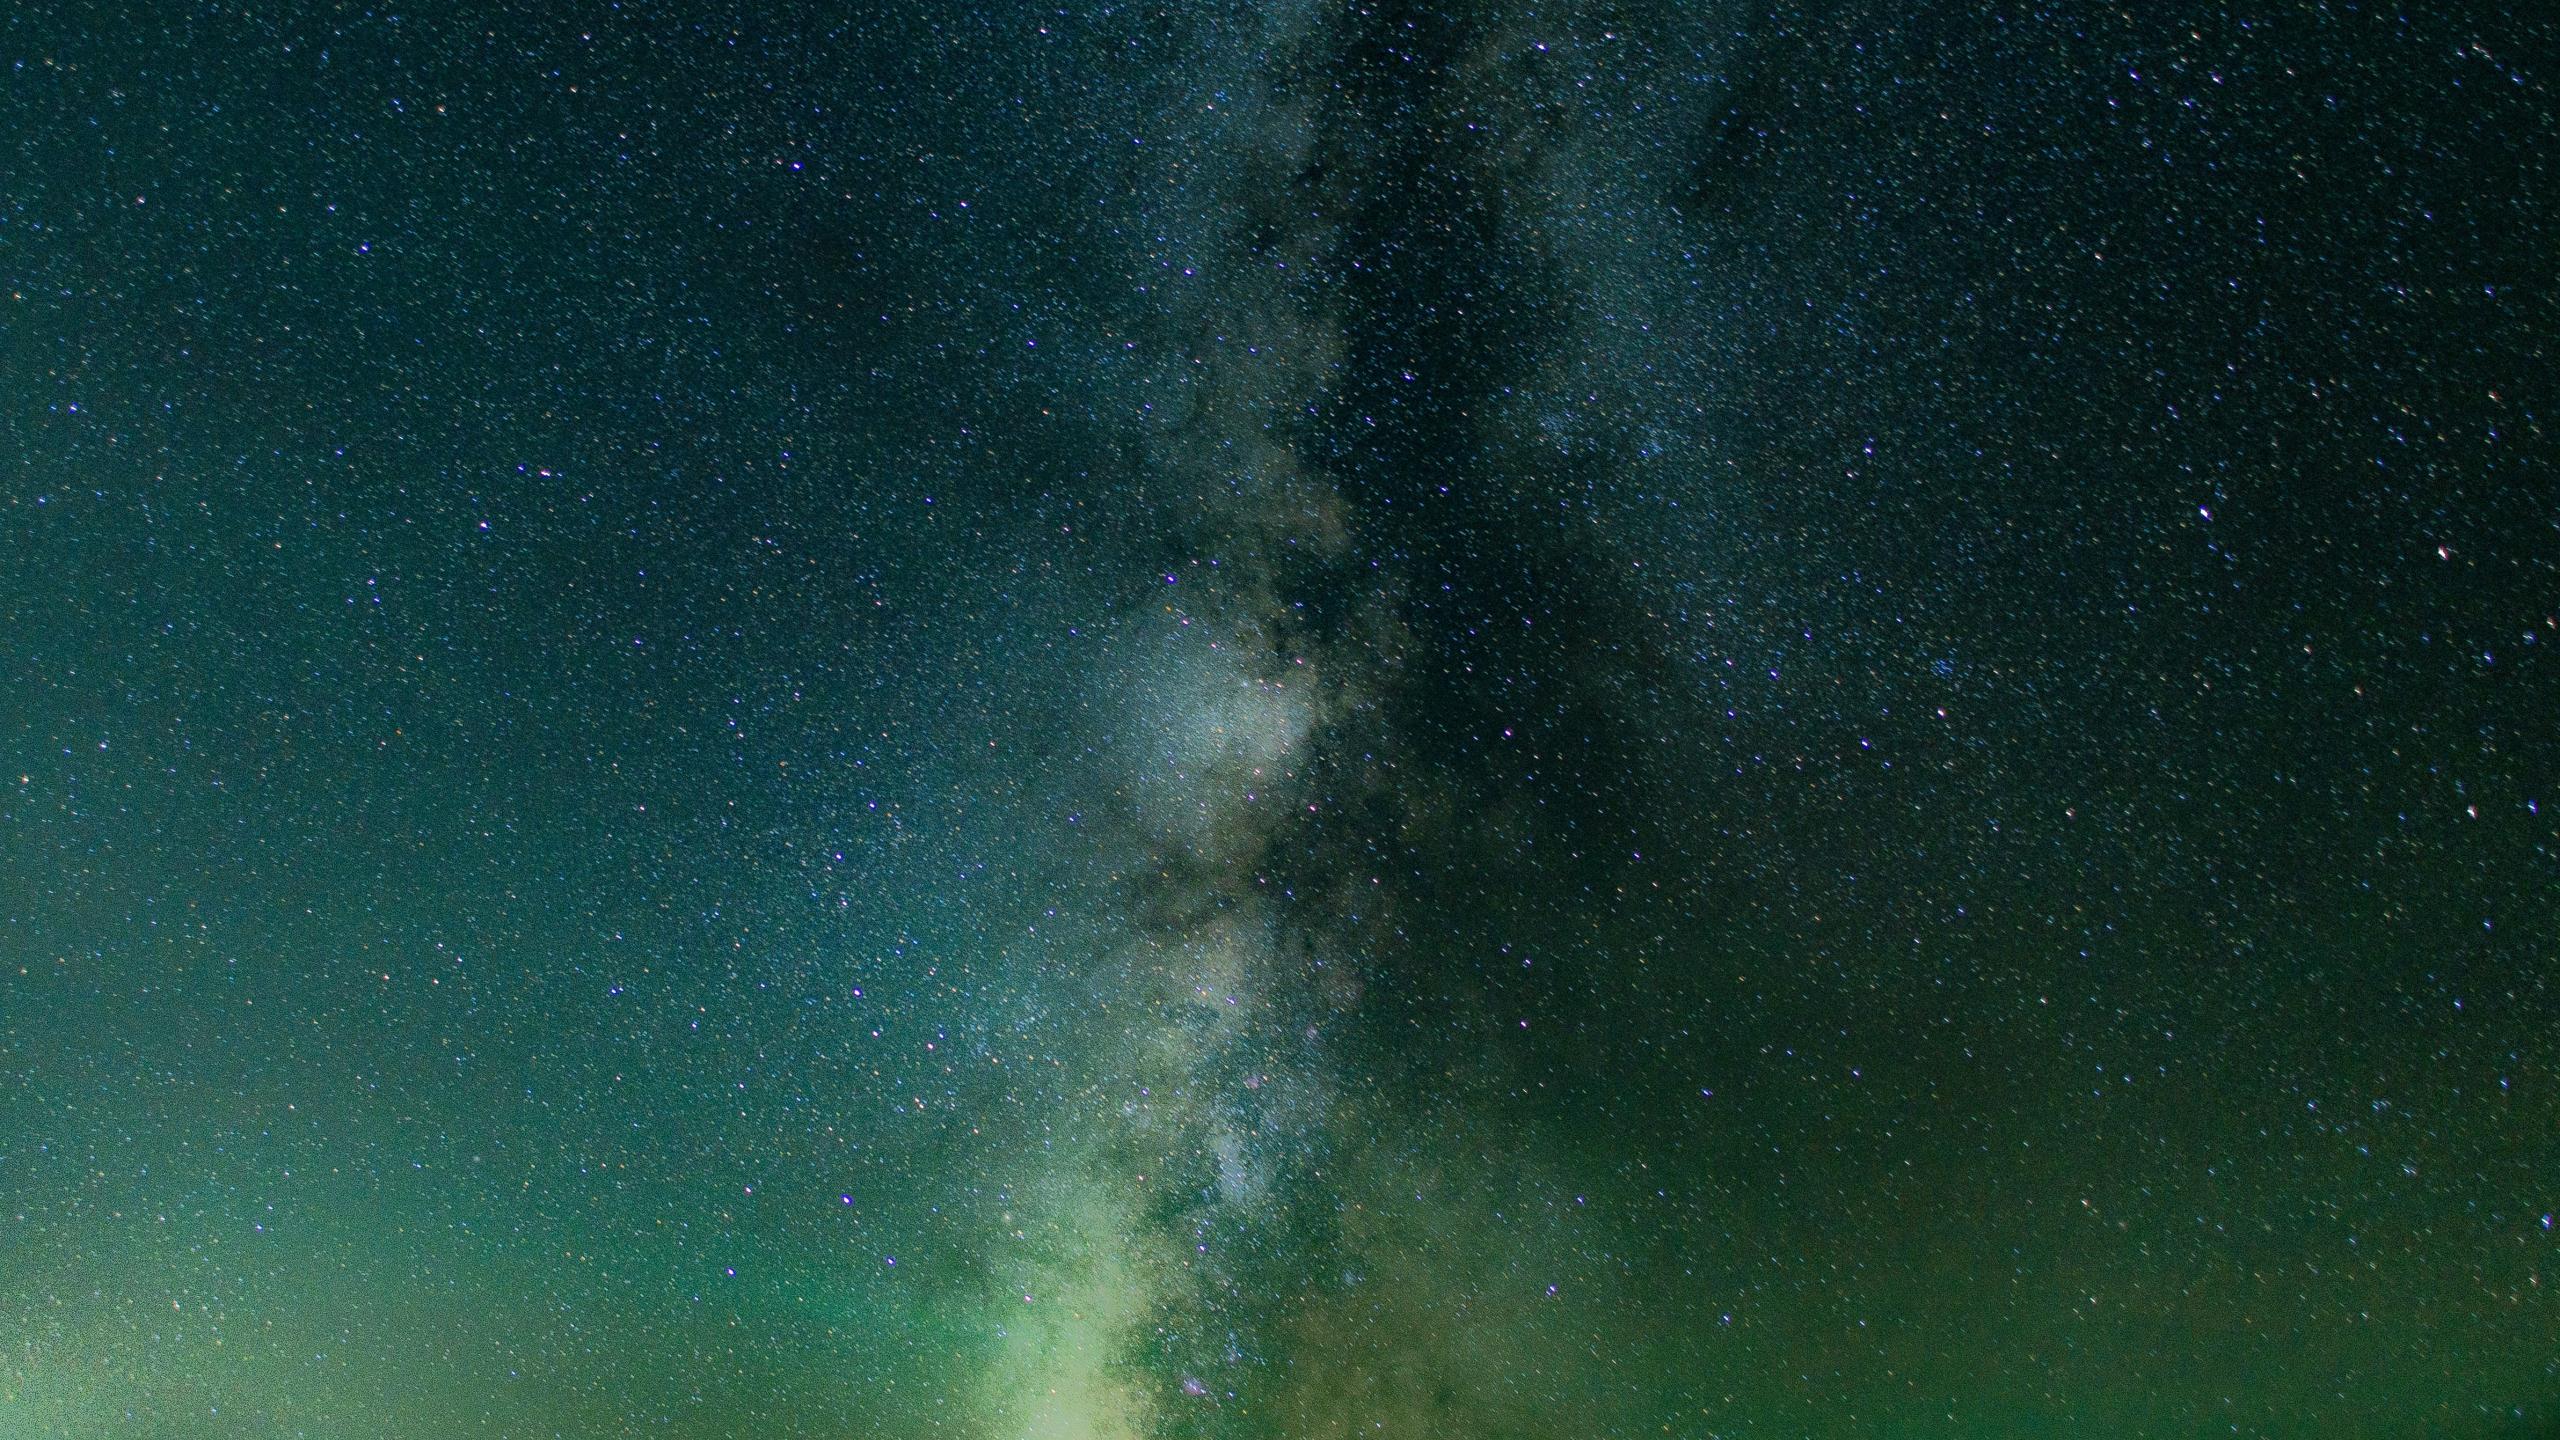 Download 2560x1440 Wallpaper Milky Way Galaxy Starry Night